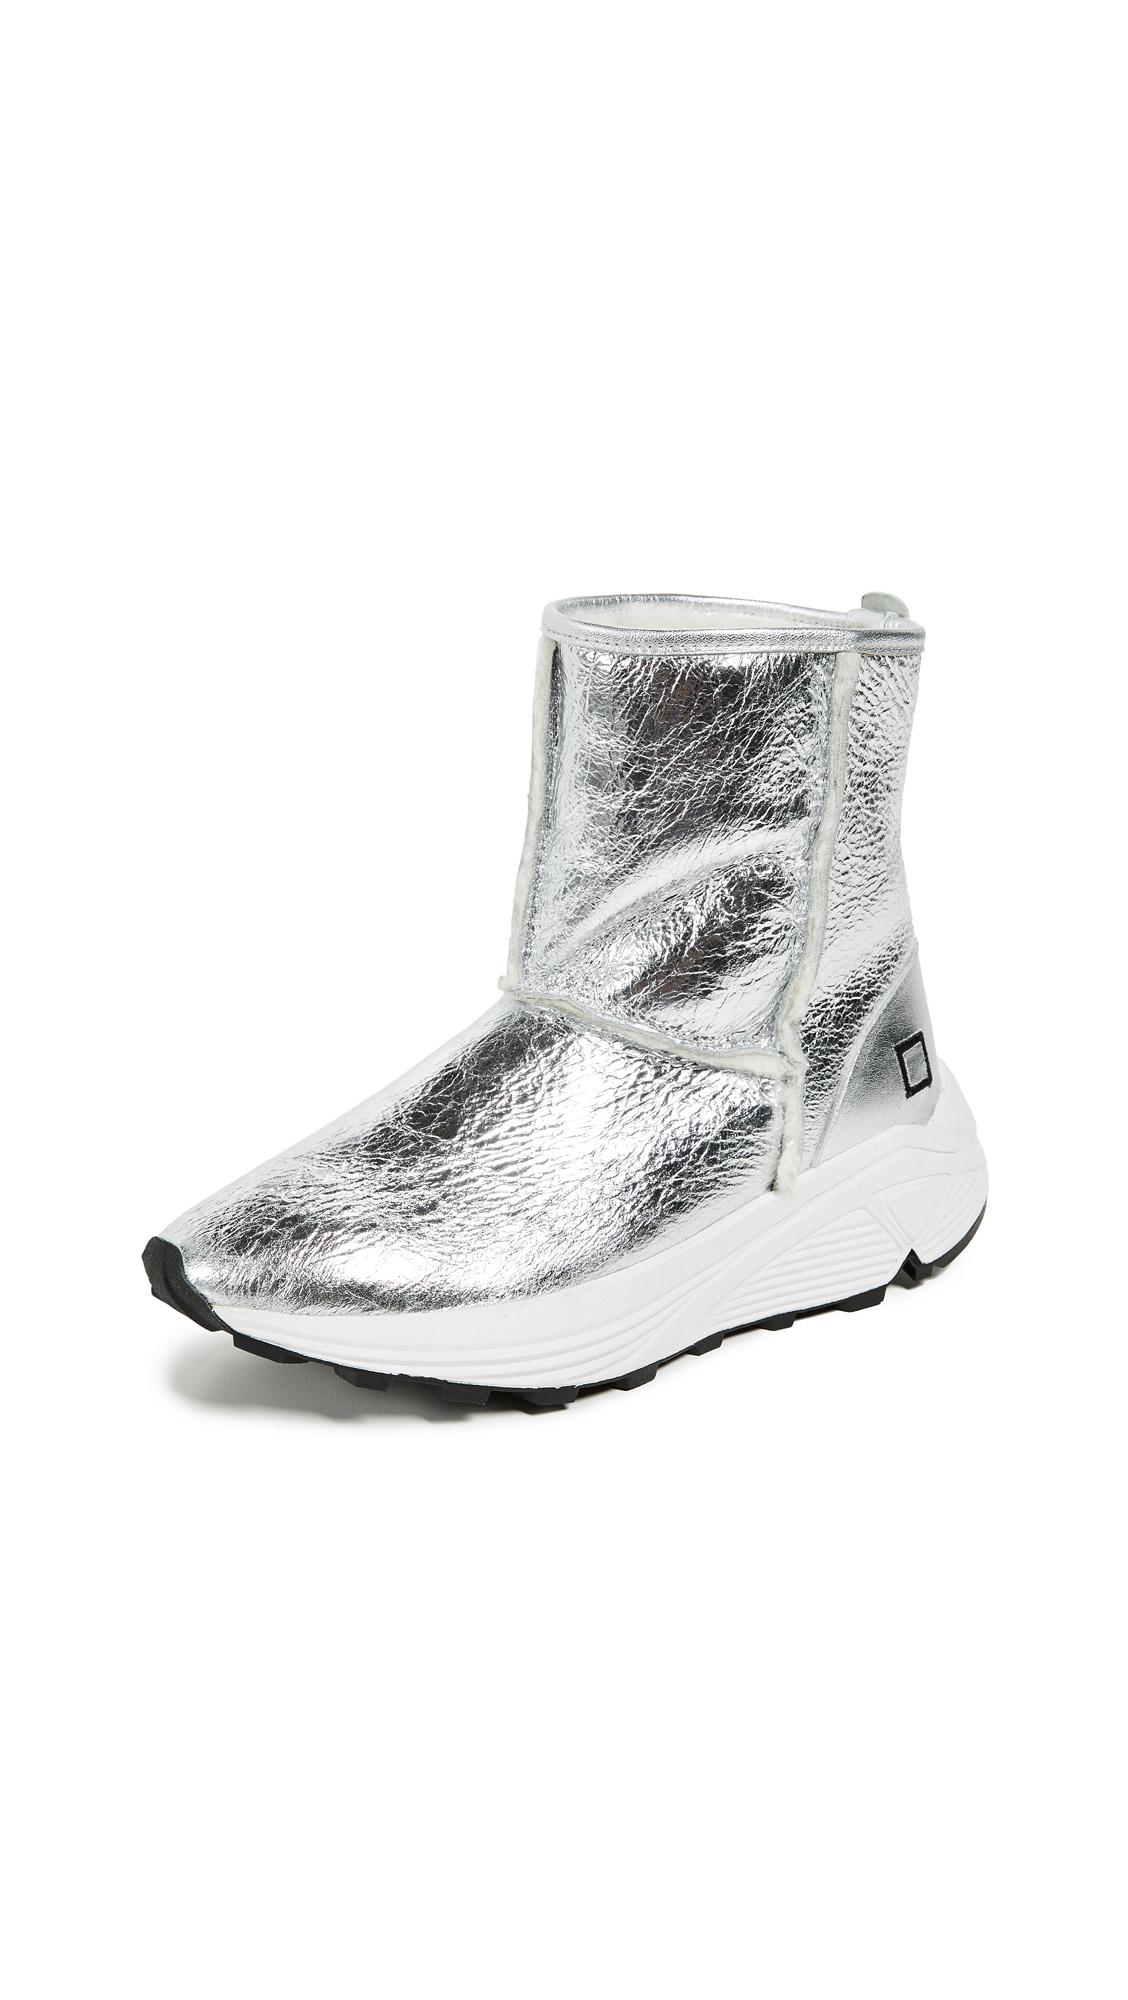 D.A.T.E. Dafne Sherpa Laminated Sneakers - Silver